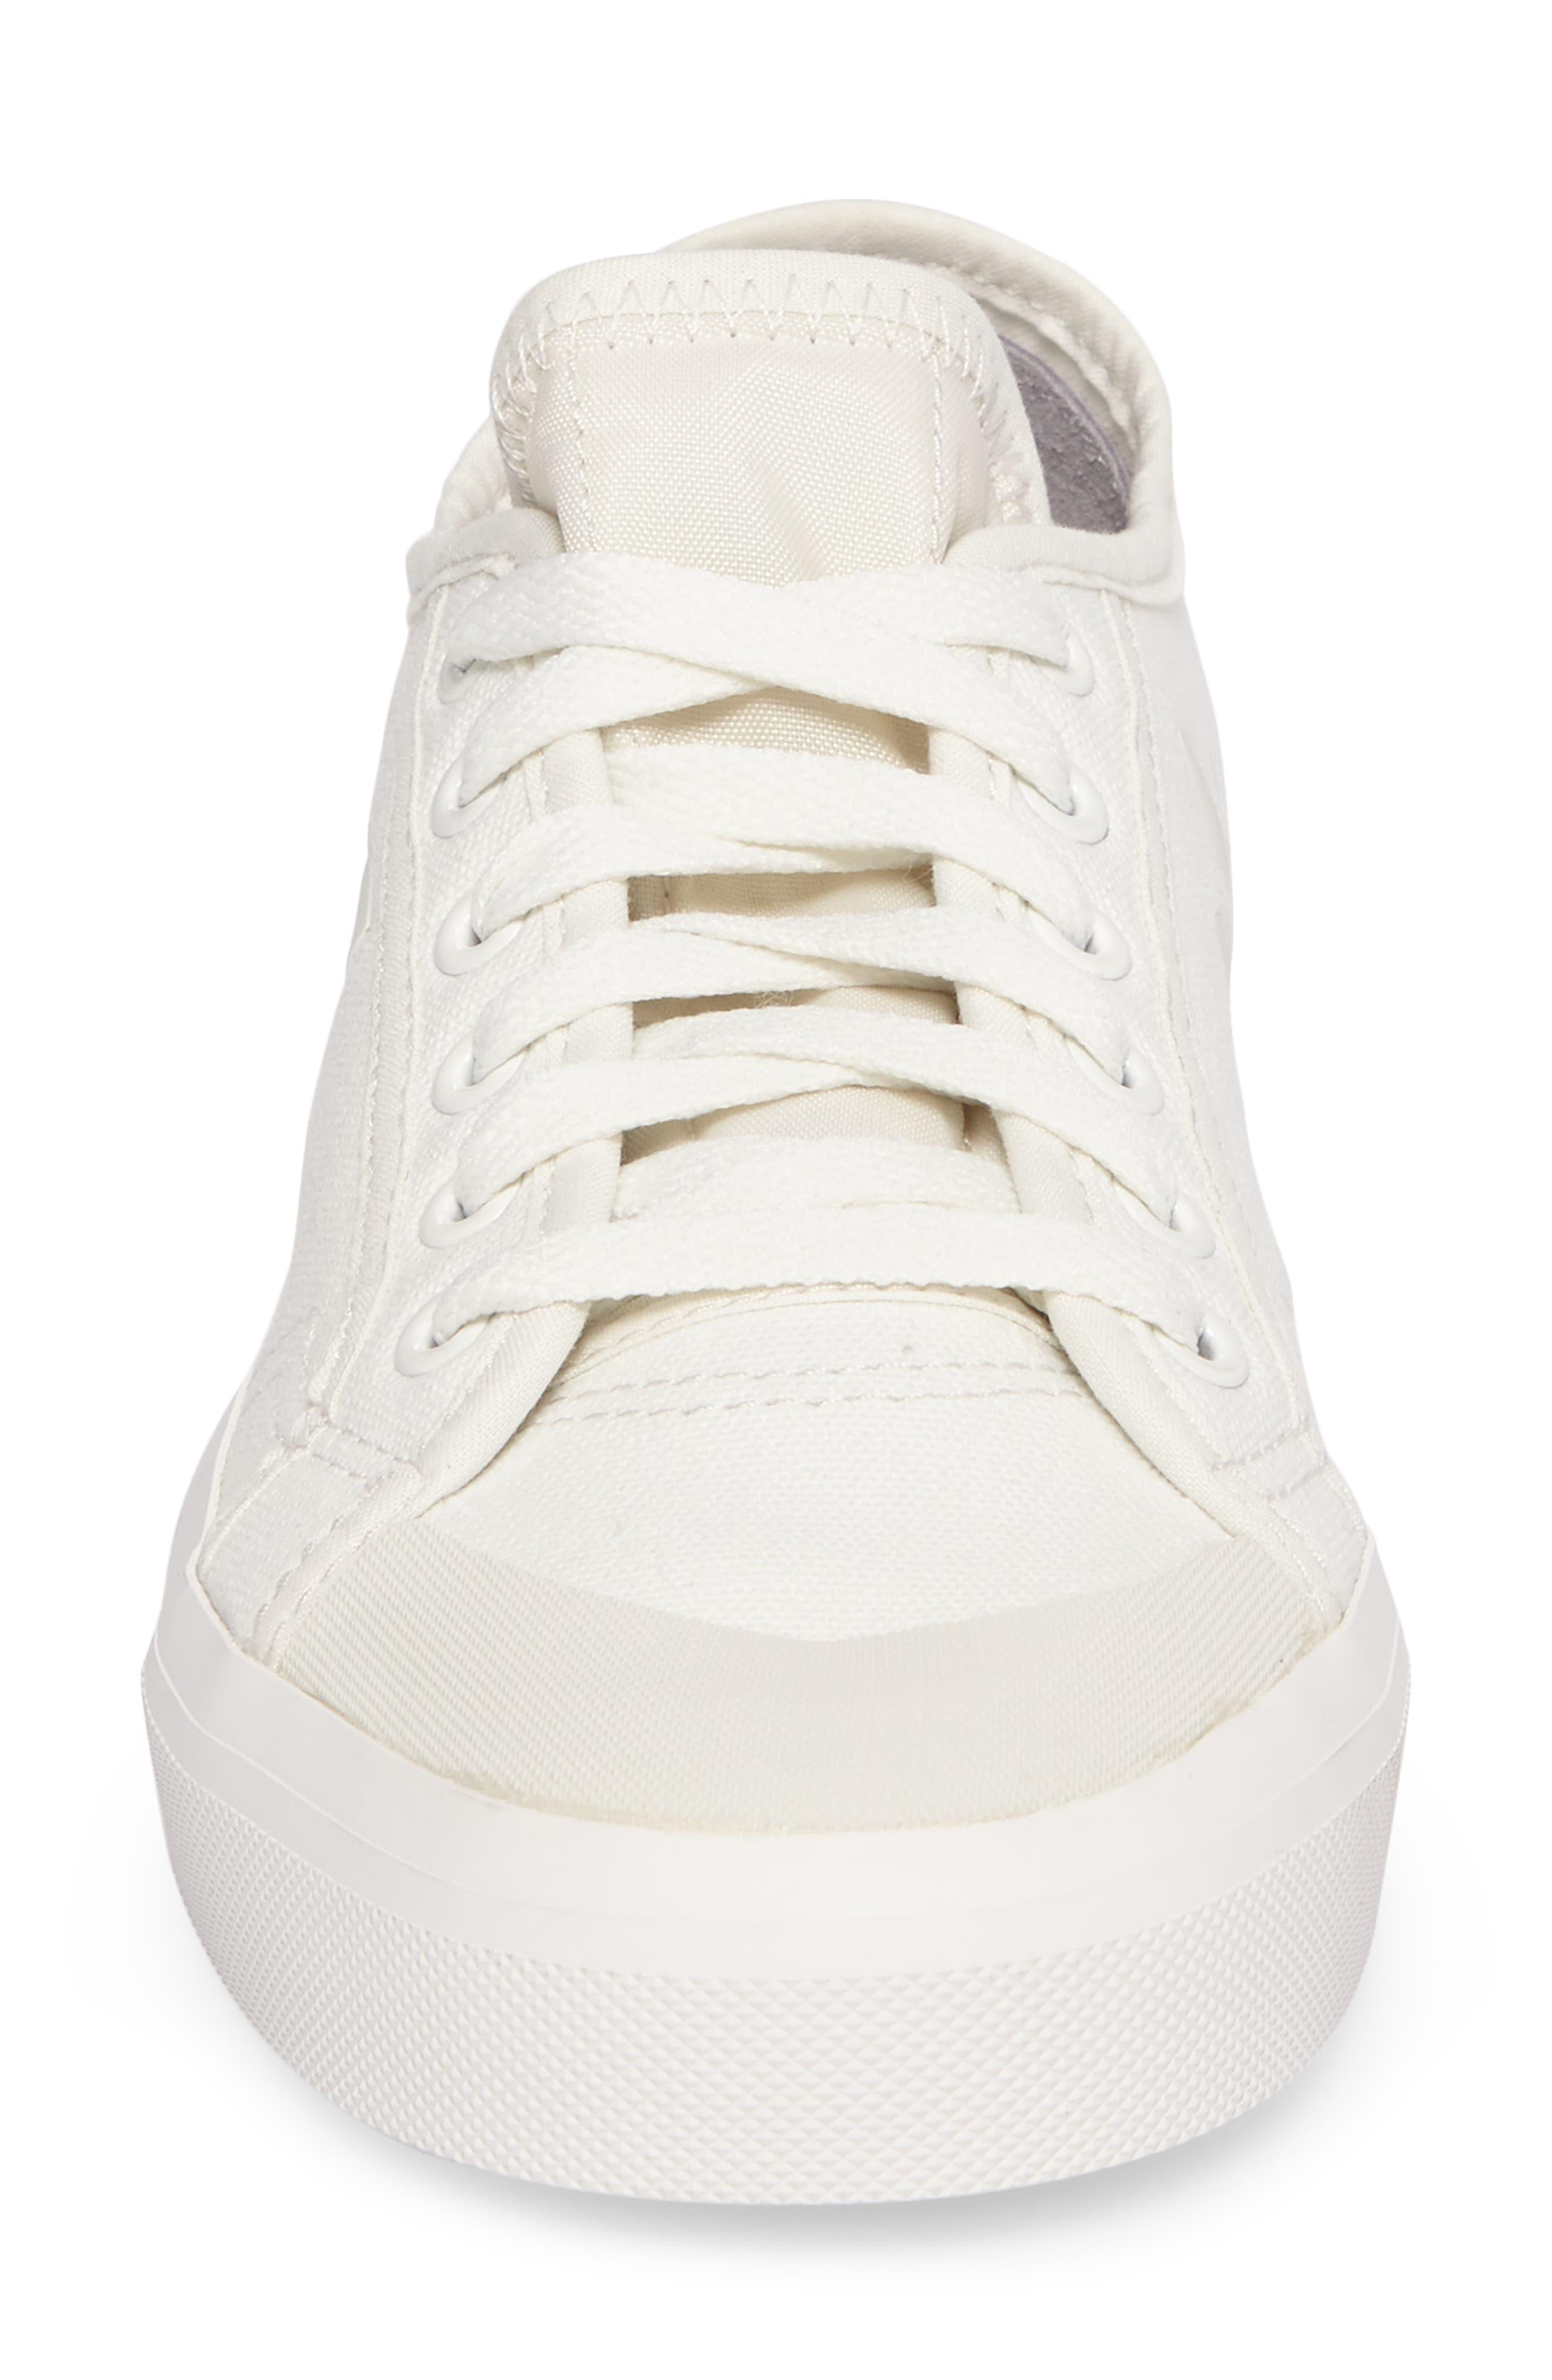 adidas by Raf Simons Spirit Low Top Sneaker,                             Alternate thumbnail 8, color,